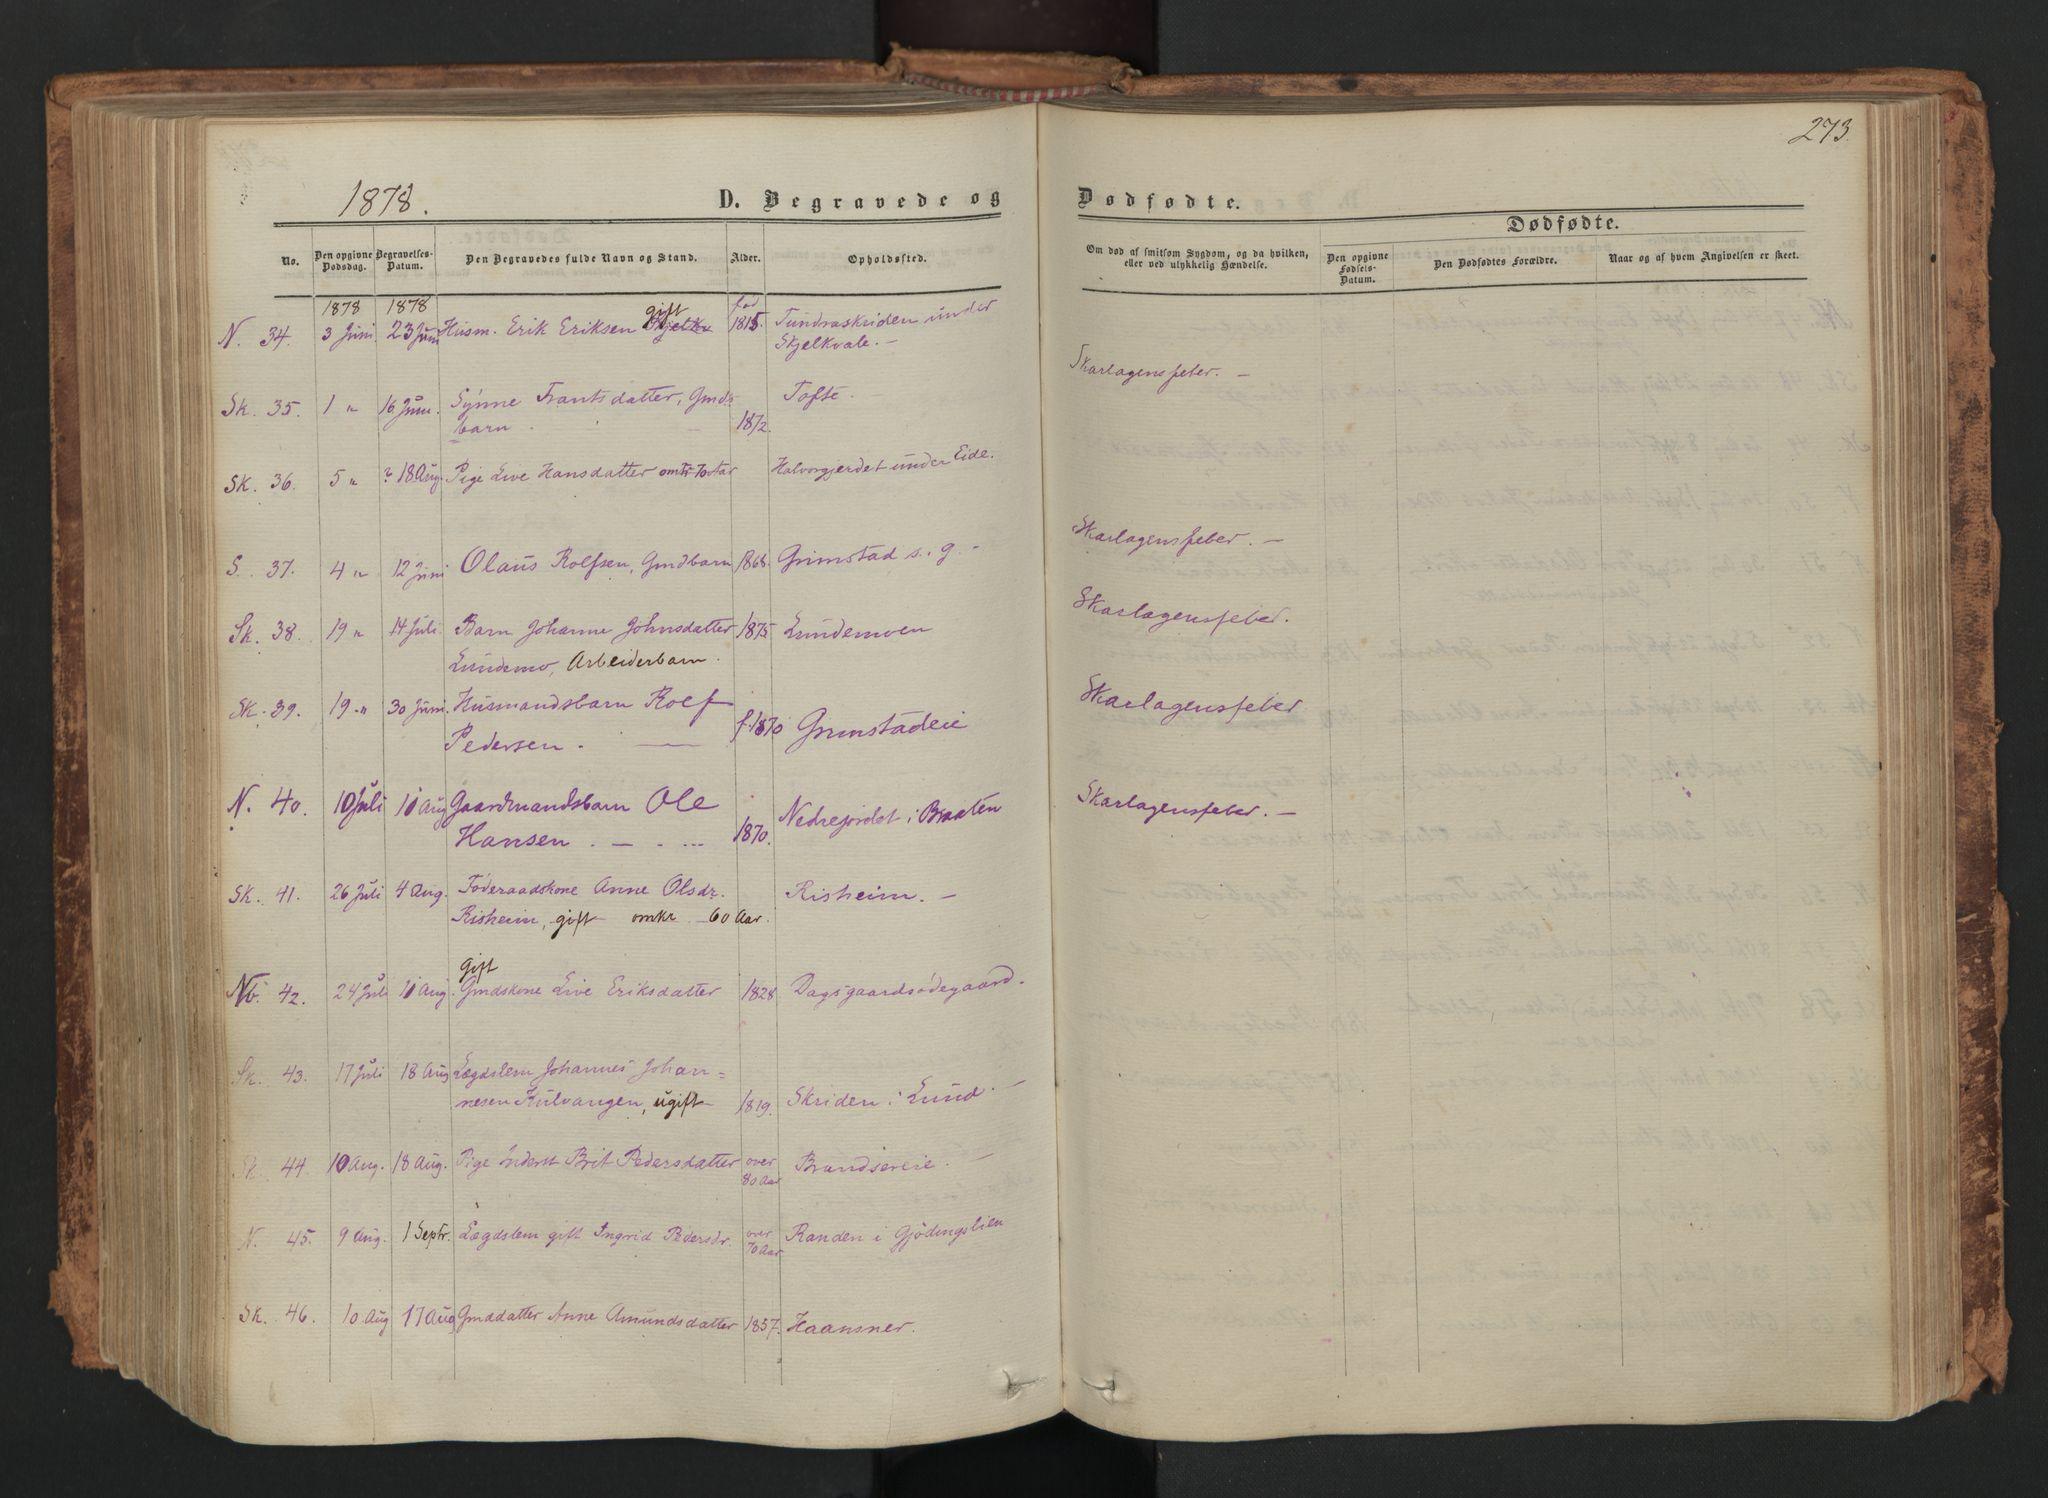 SAH, Skjåk prestekontor, Ministerialbok nr. 1, 1863-1879, s. 273